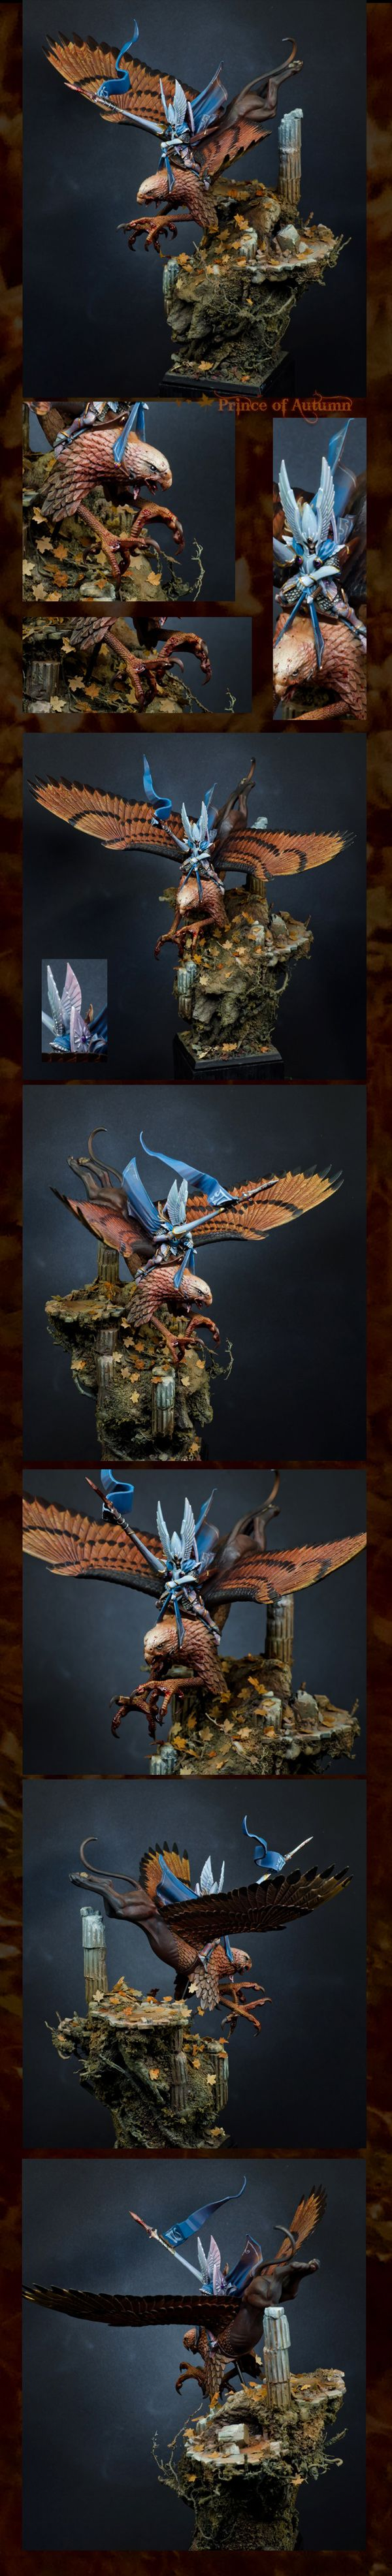 Prince of Autumn - High Elf Prince on Griffon